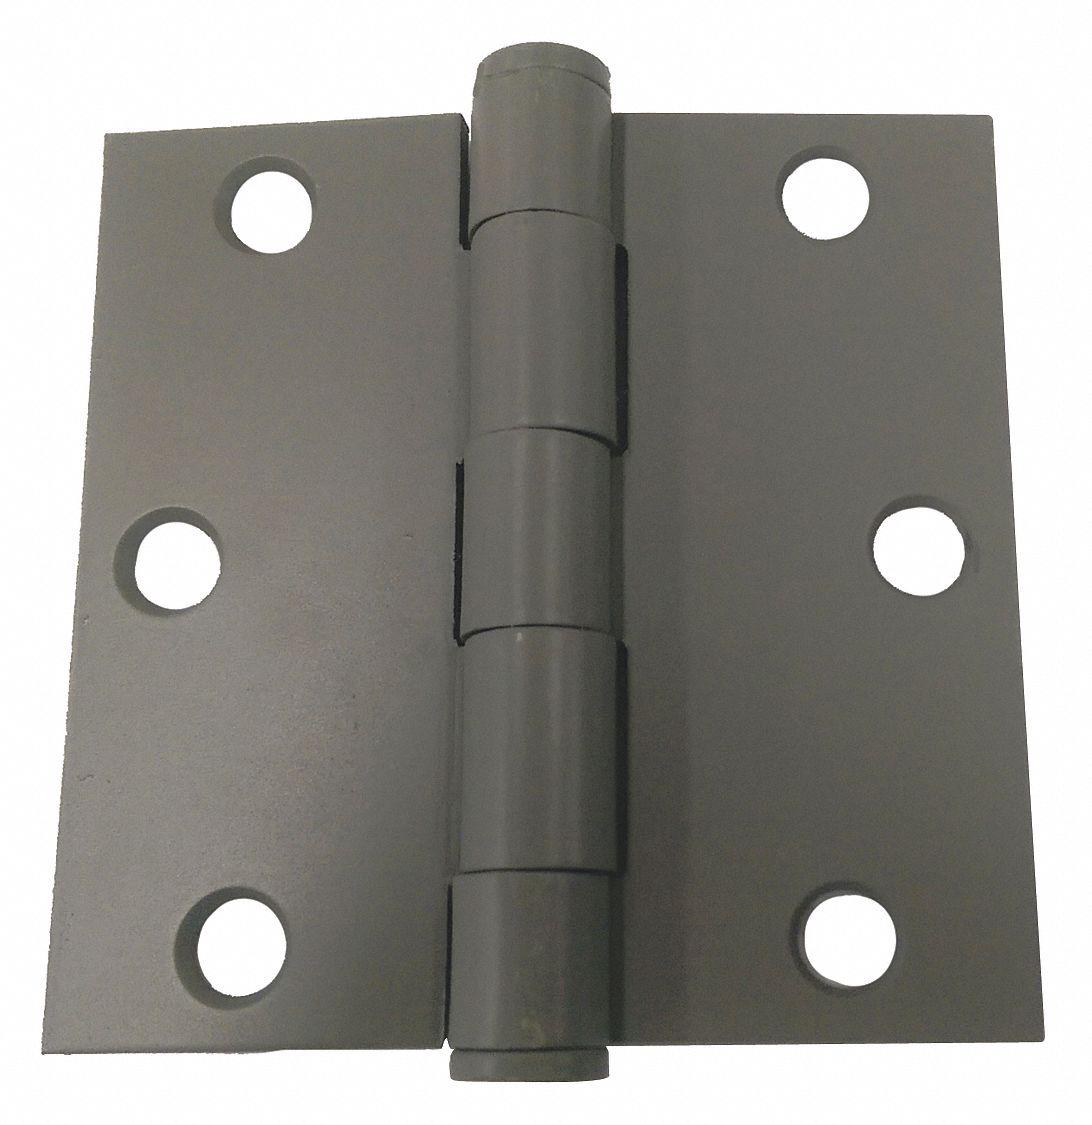 GRAINGER APPROVED 4LVH4 Post Hinge,Steel,2-3//8 In Dia.